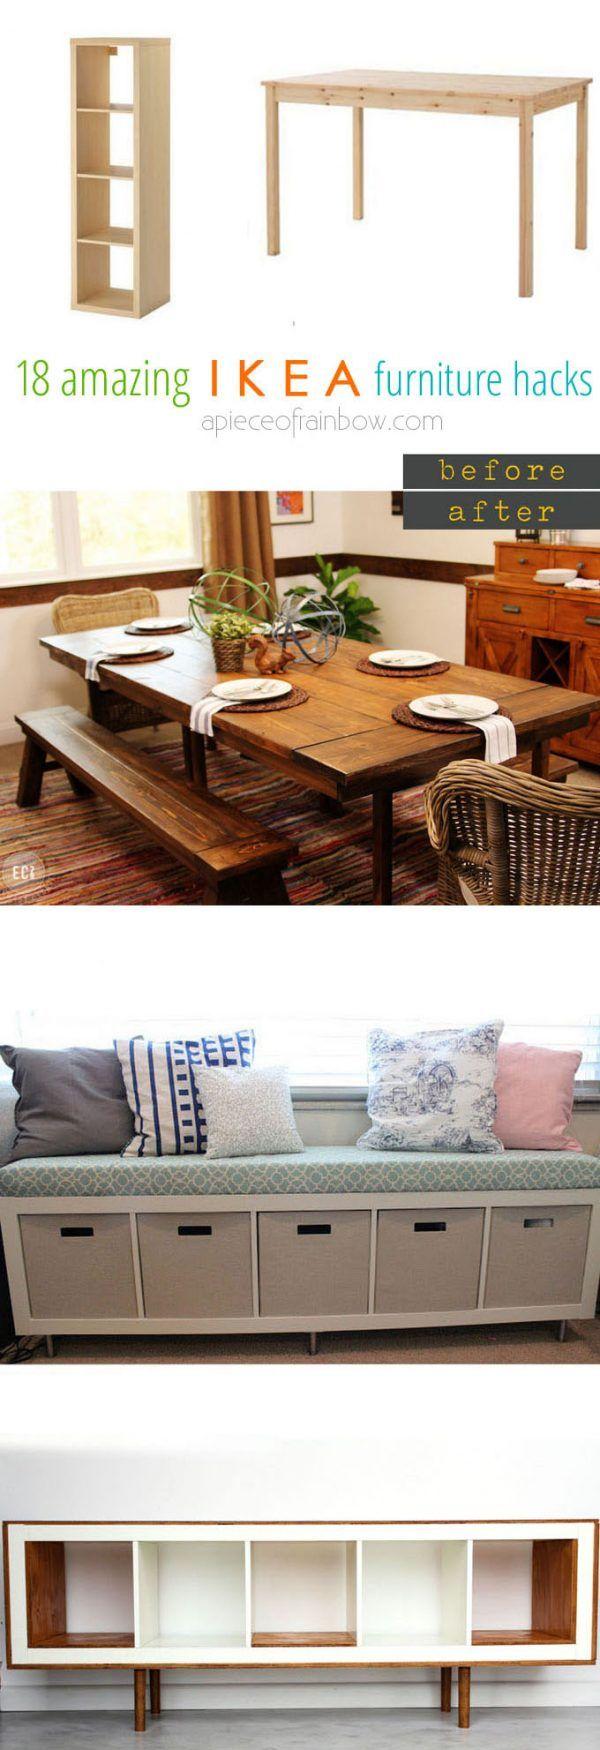 ikea-hacks-custom-furniture-apieceofrainbow-2